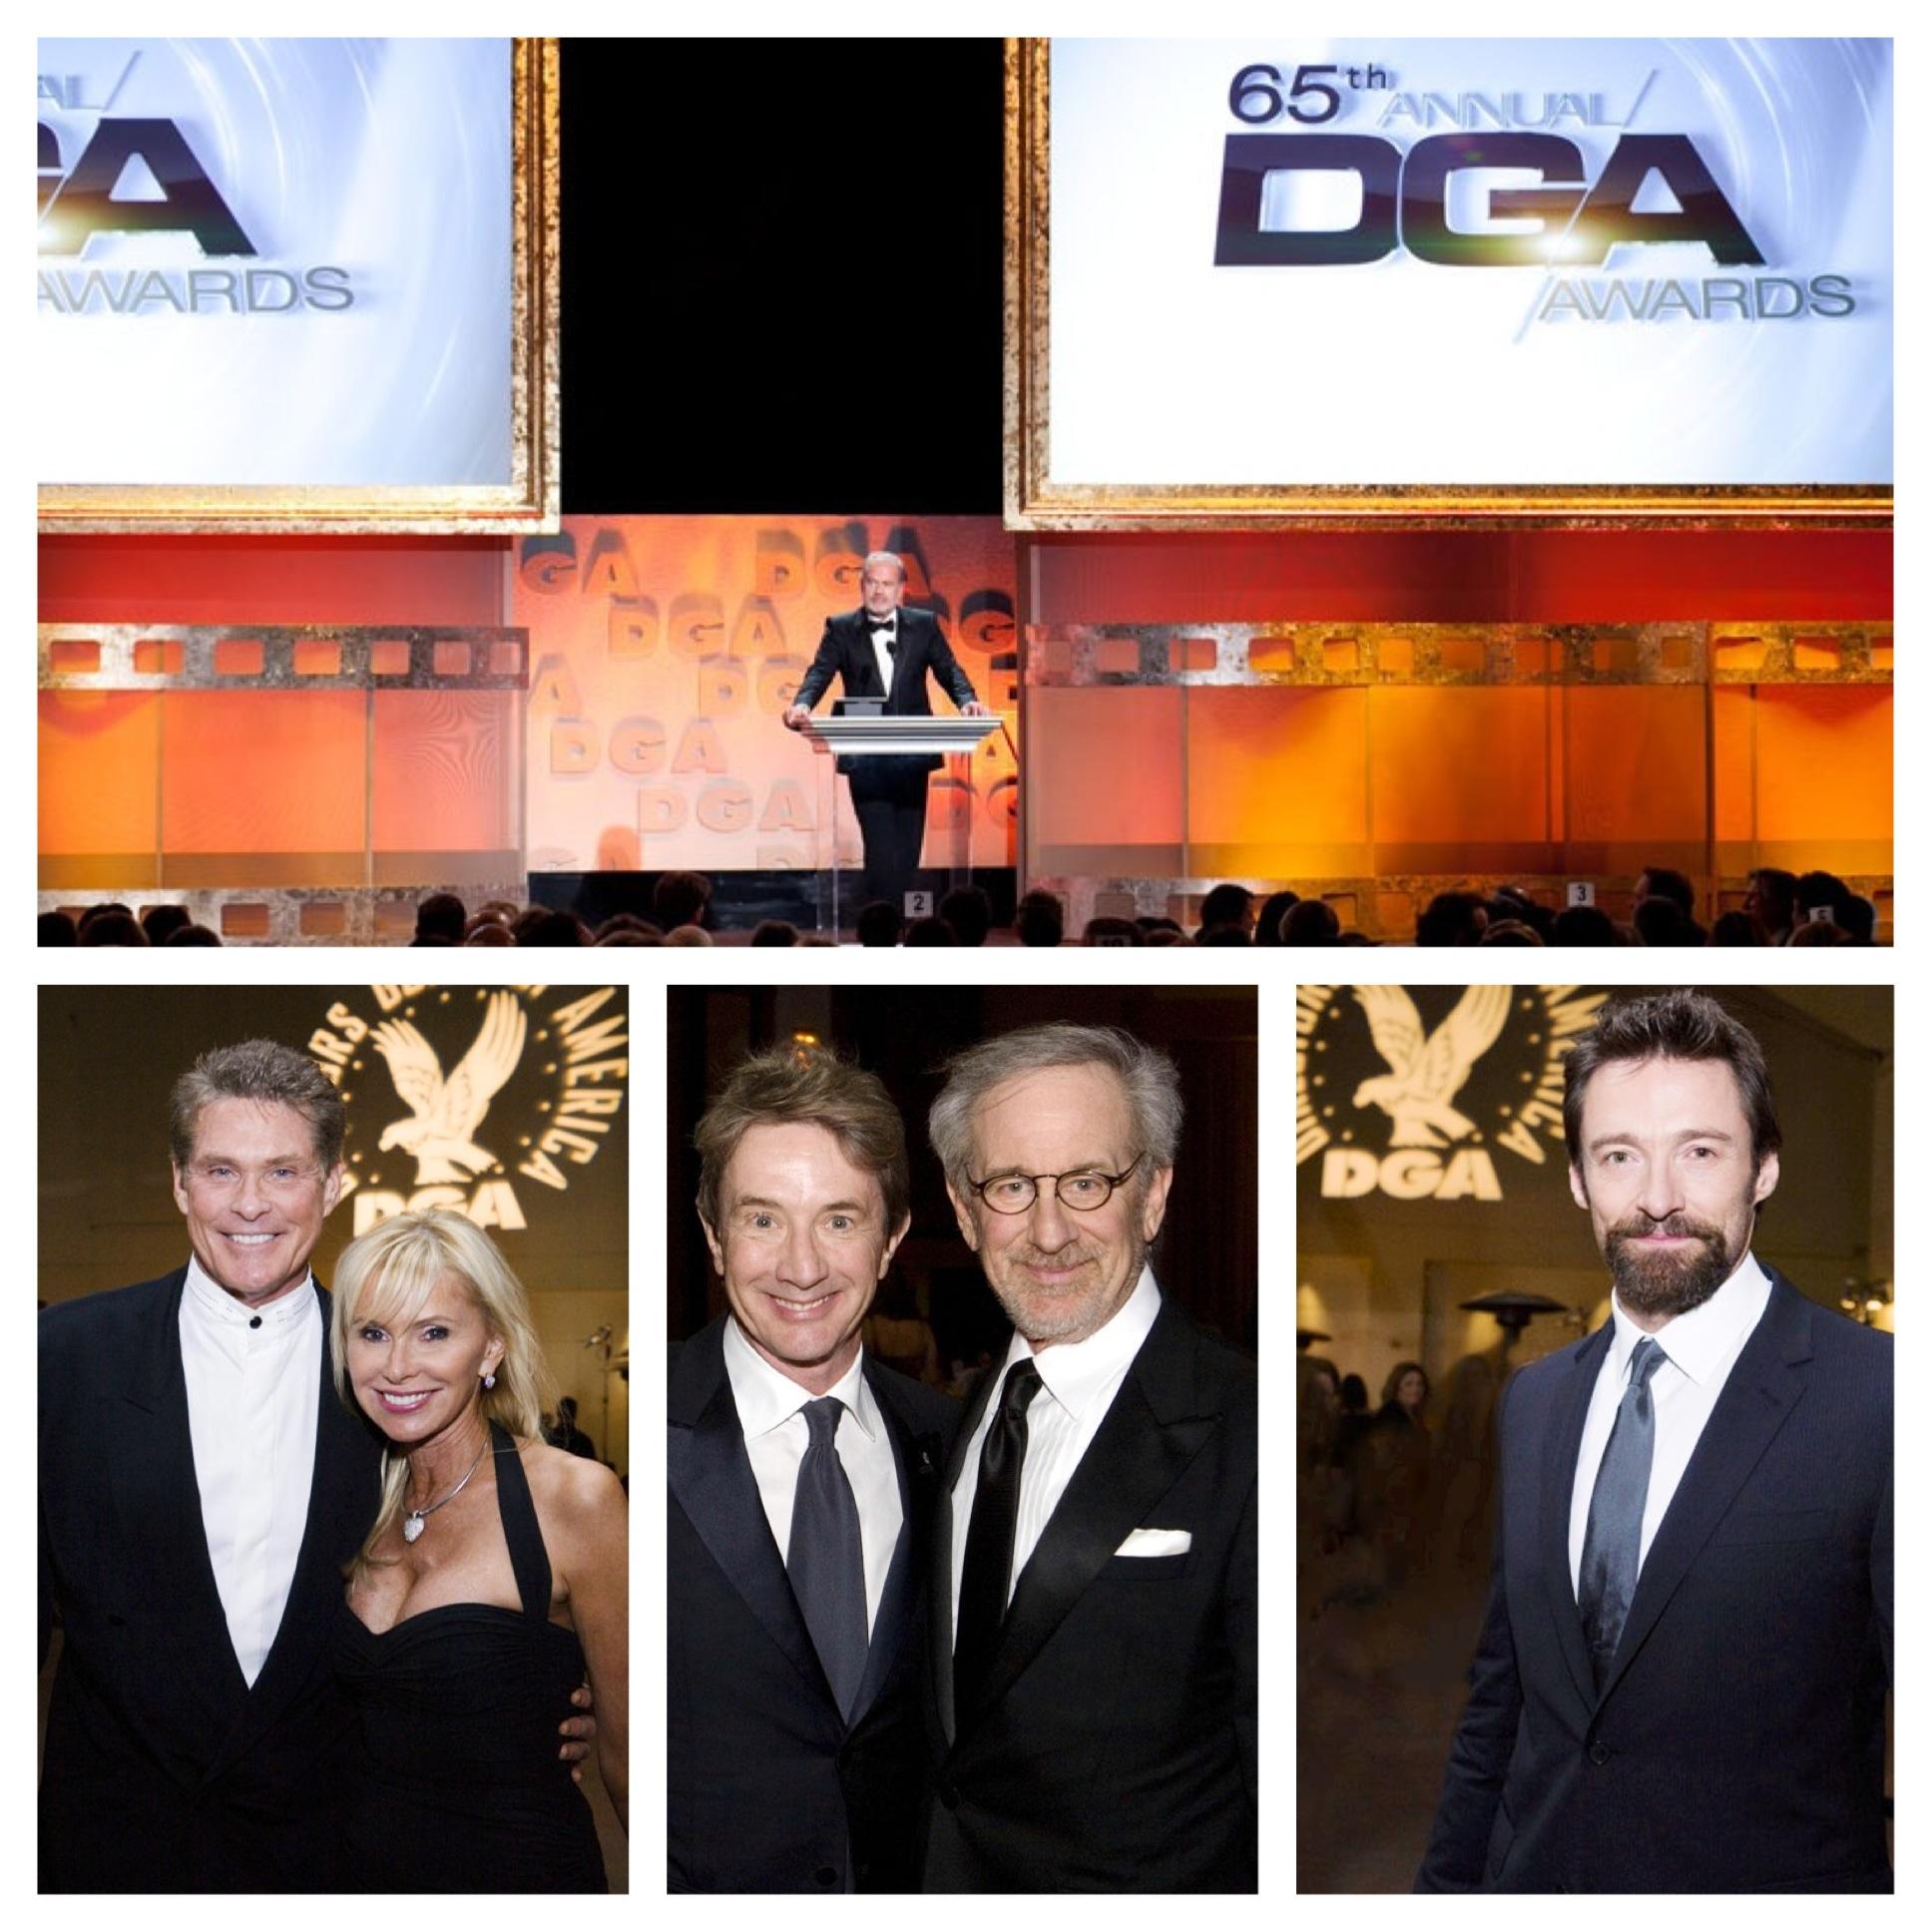 DGA_Awards_Guests.JPG